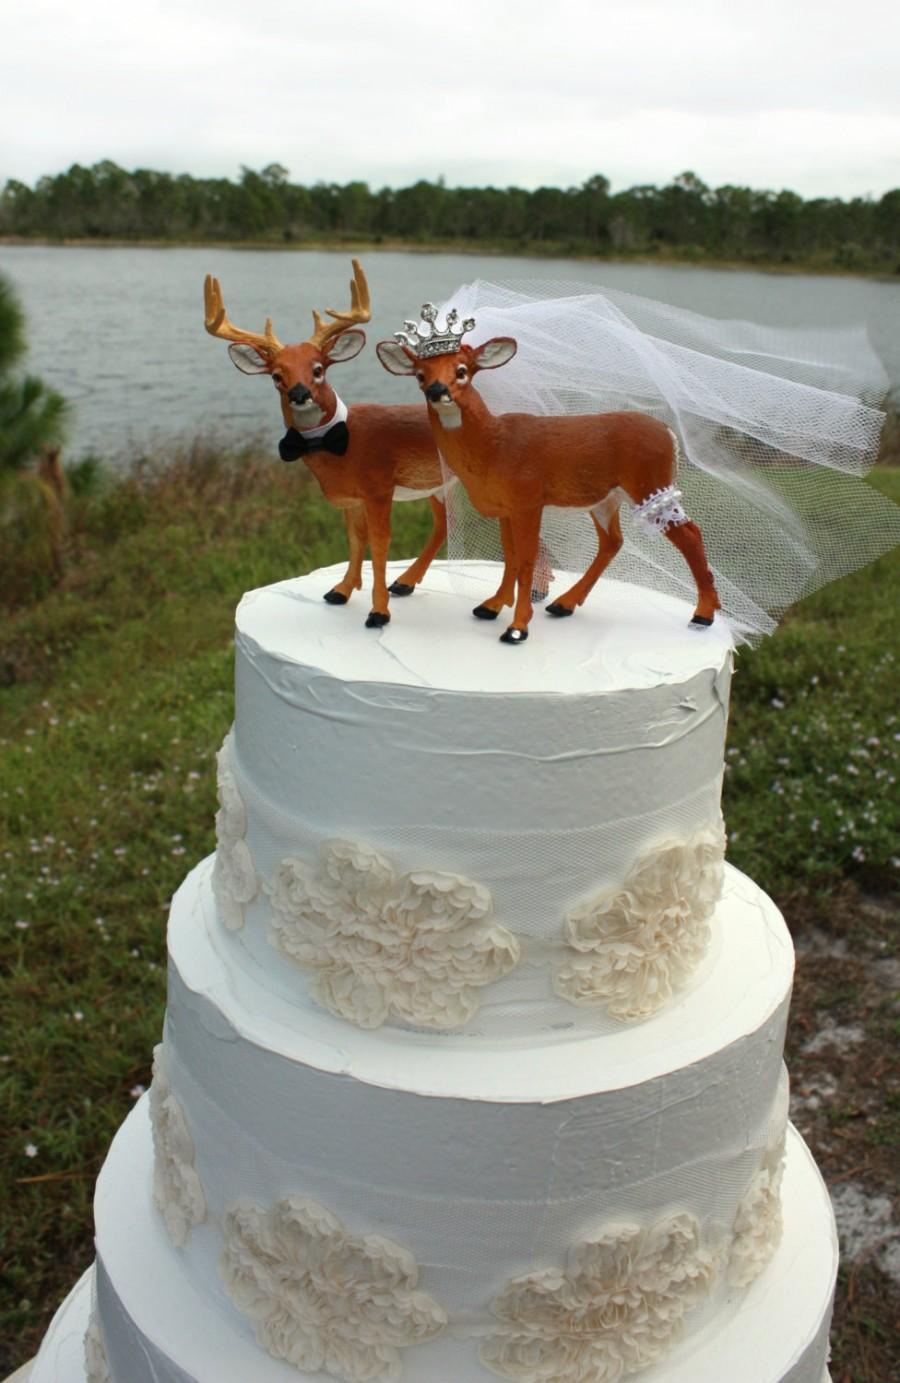 Mariage - Buck-doe-bride-groom-princess-tiara-deer-white tail-hunting-hunter-camouflage-wedding-cake topper-wild life-nature-western